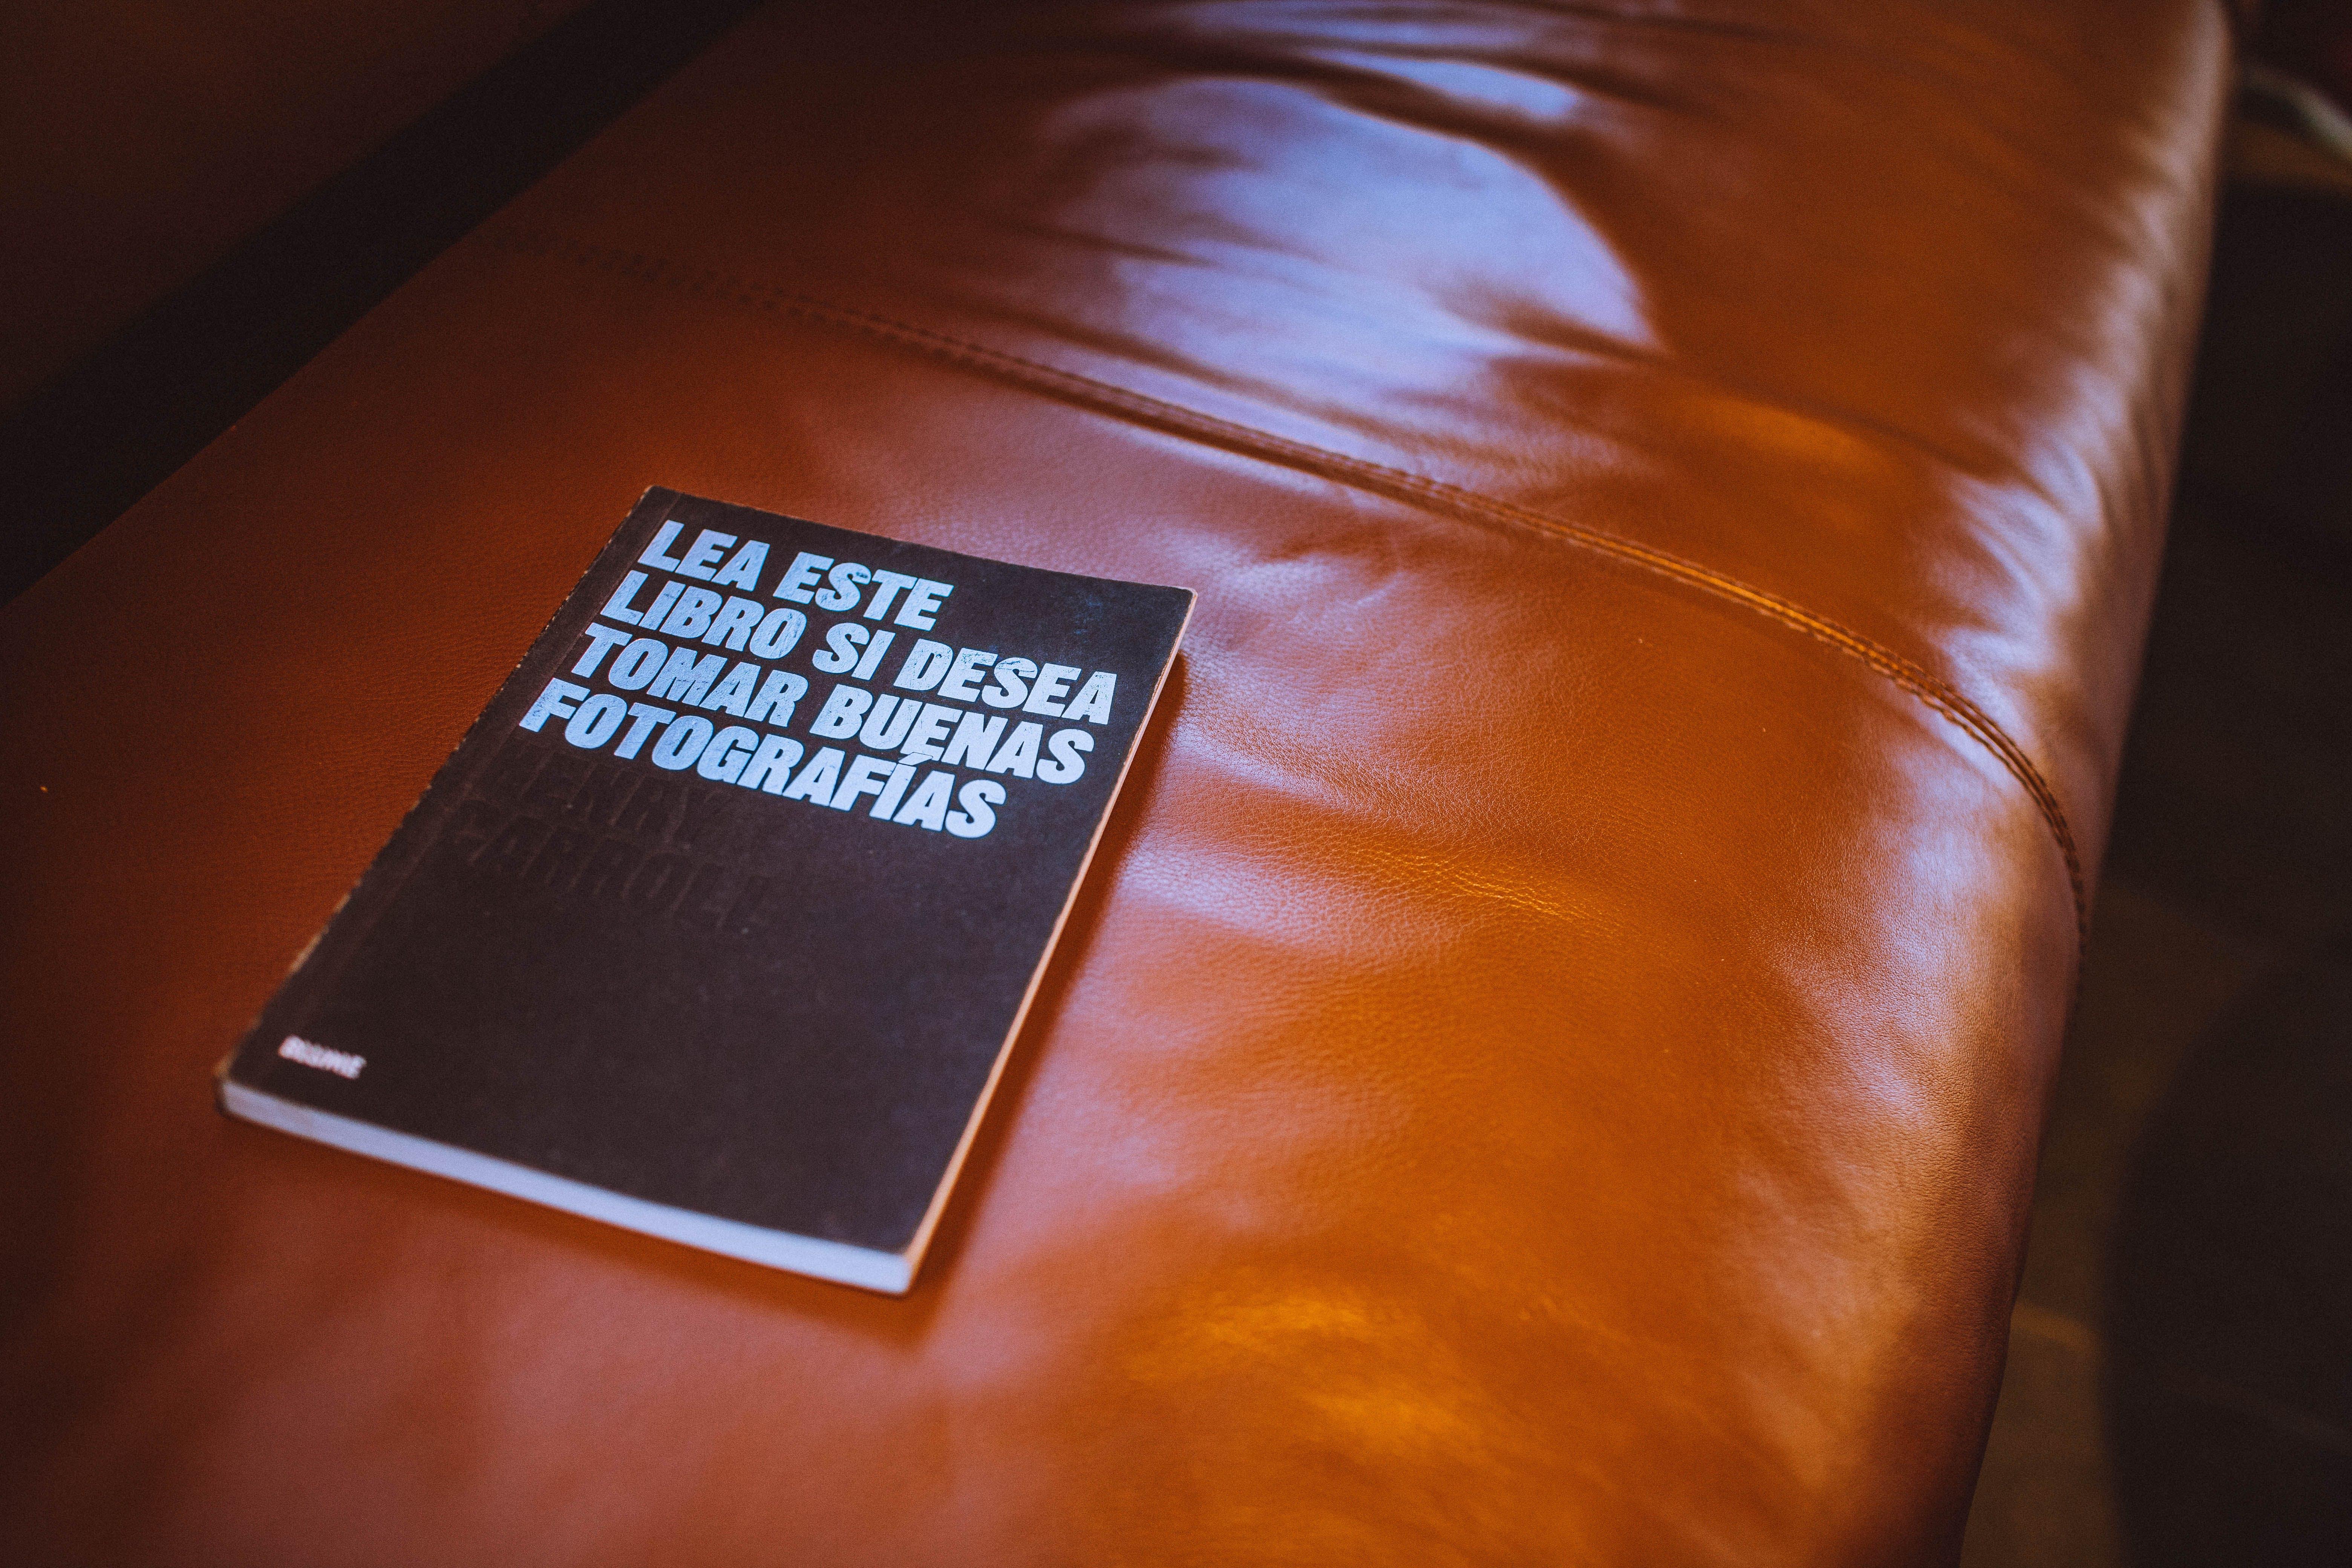 Book On Sofa